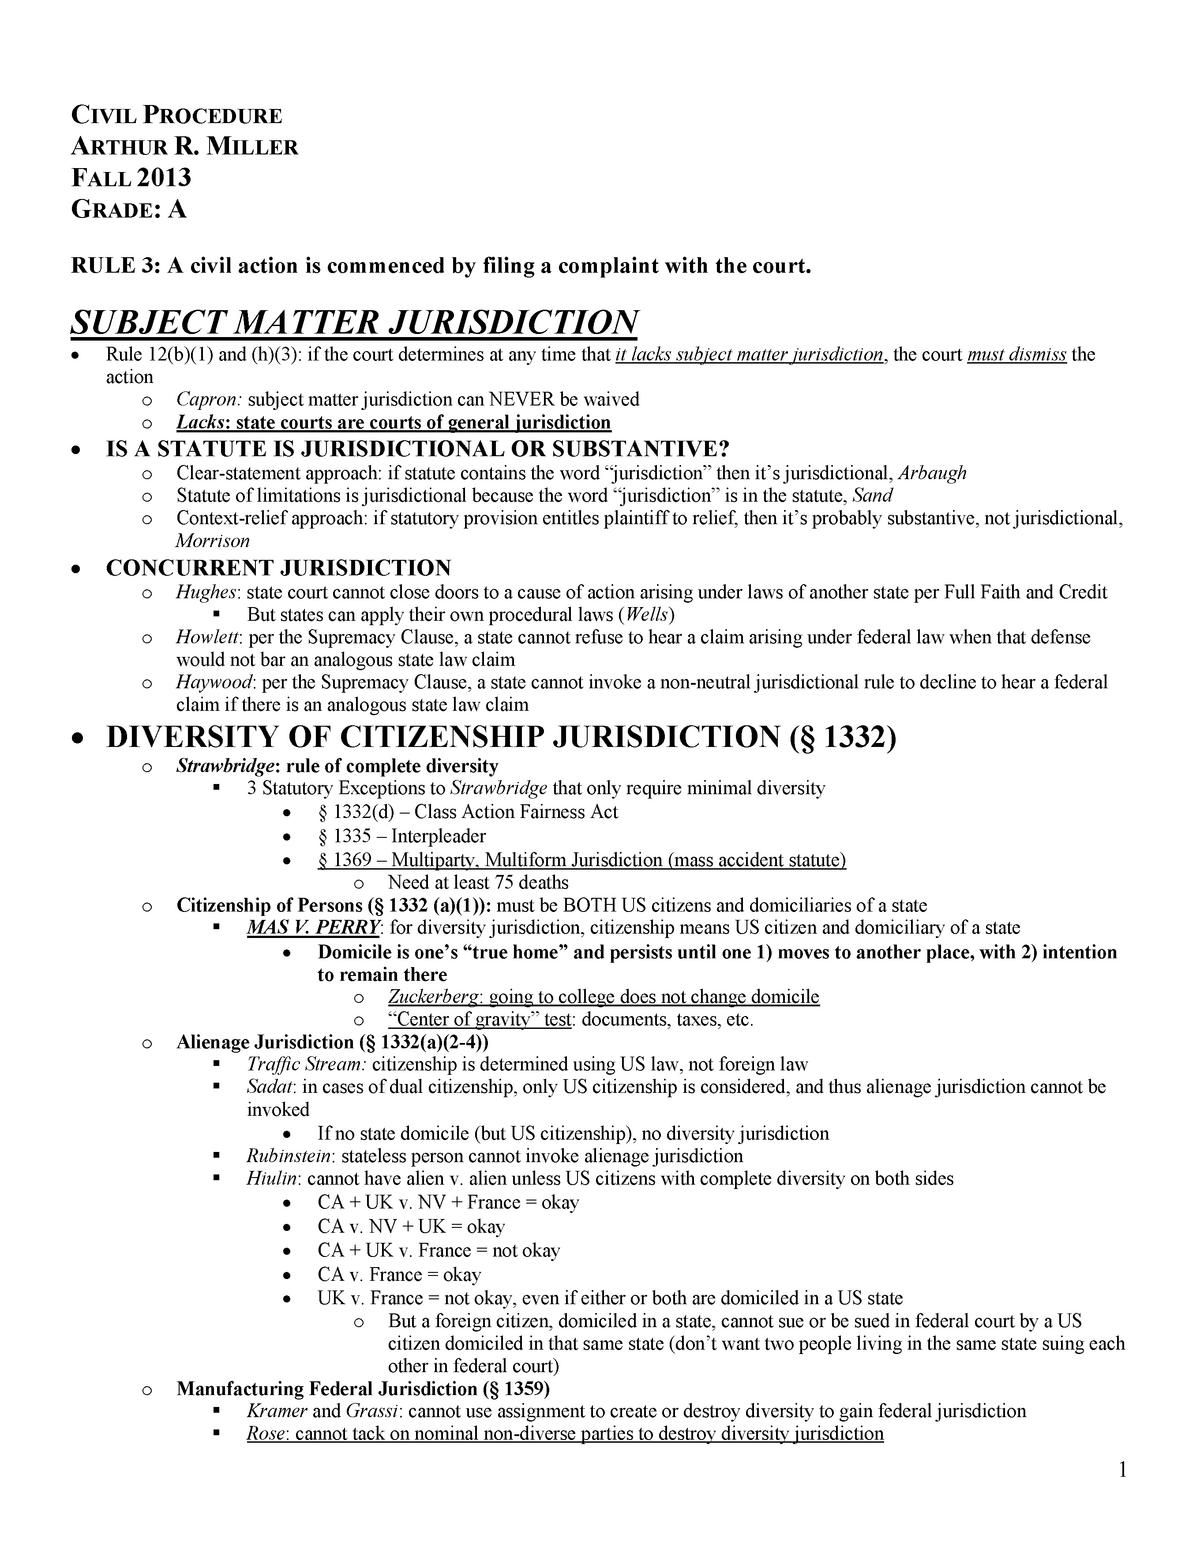 Civil Procedure - LAW 6300 - StuDocu